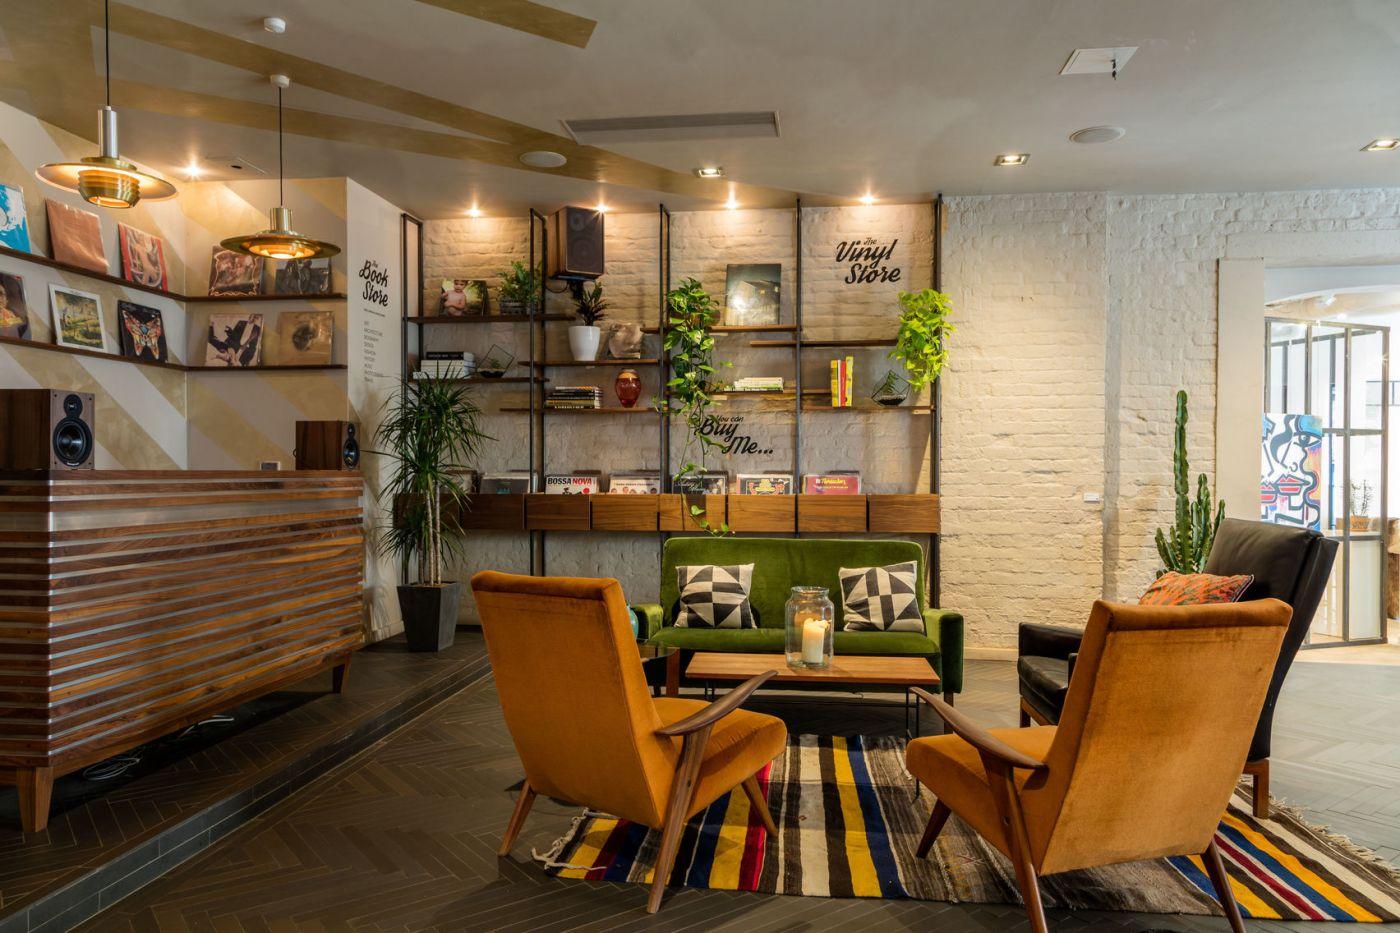 A lounge venue in Islington with orange sofas and scandi design.